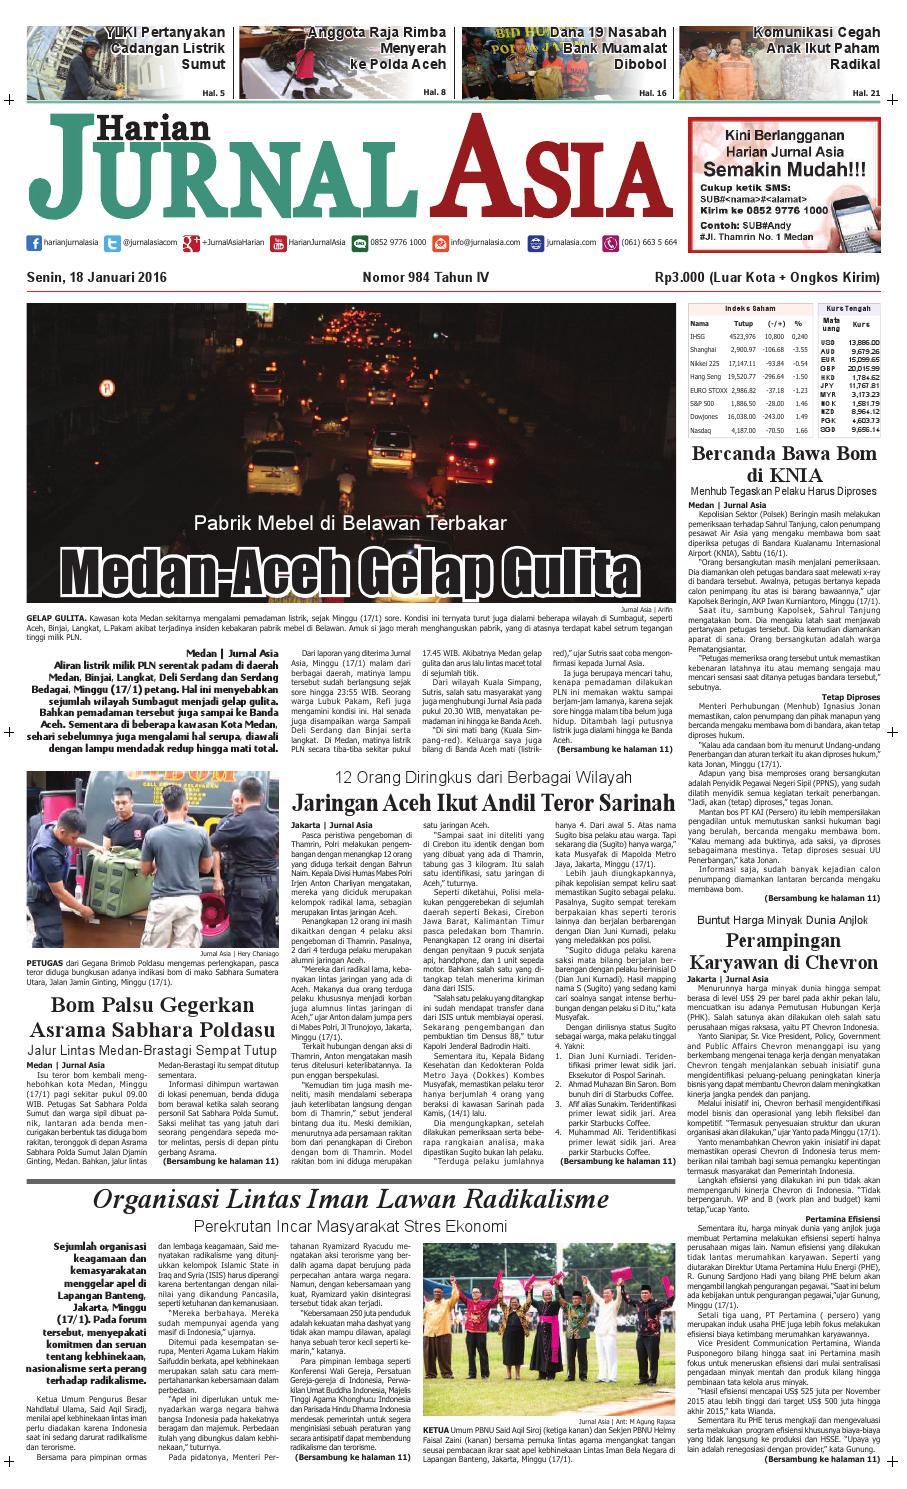 Harian Jurnal Asia Edisi Senin, 18 Januari 2016 by Harian Jurnal Asia - Medan - issuu